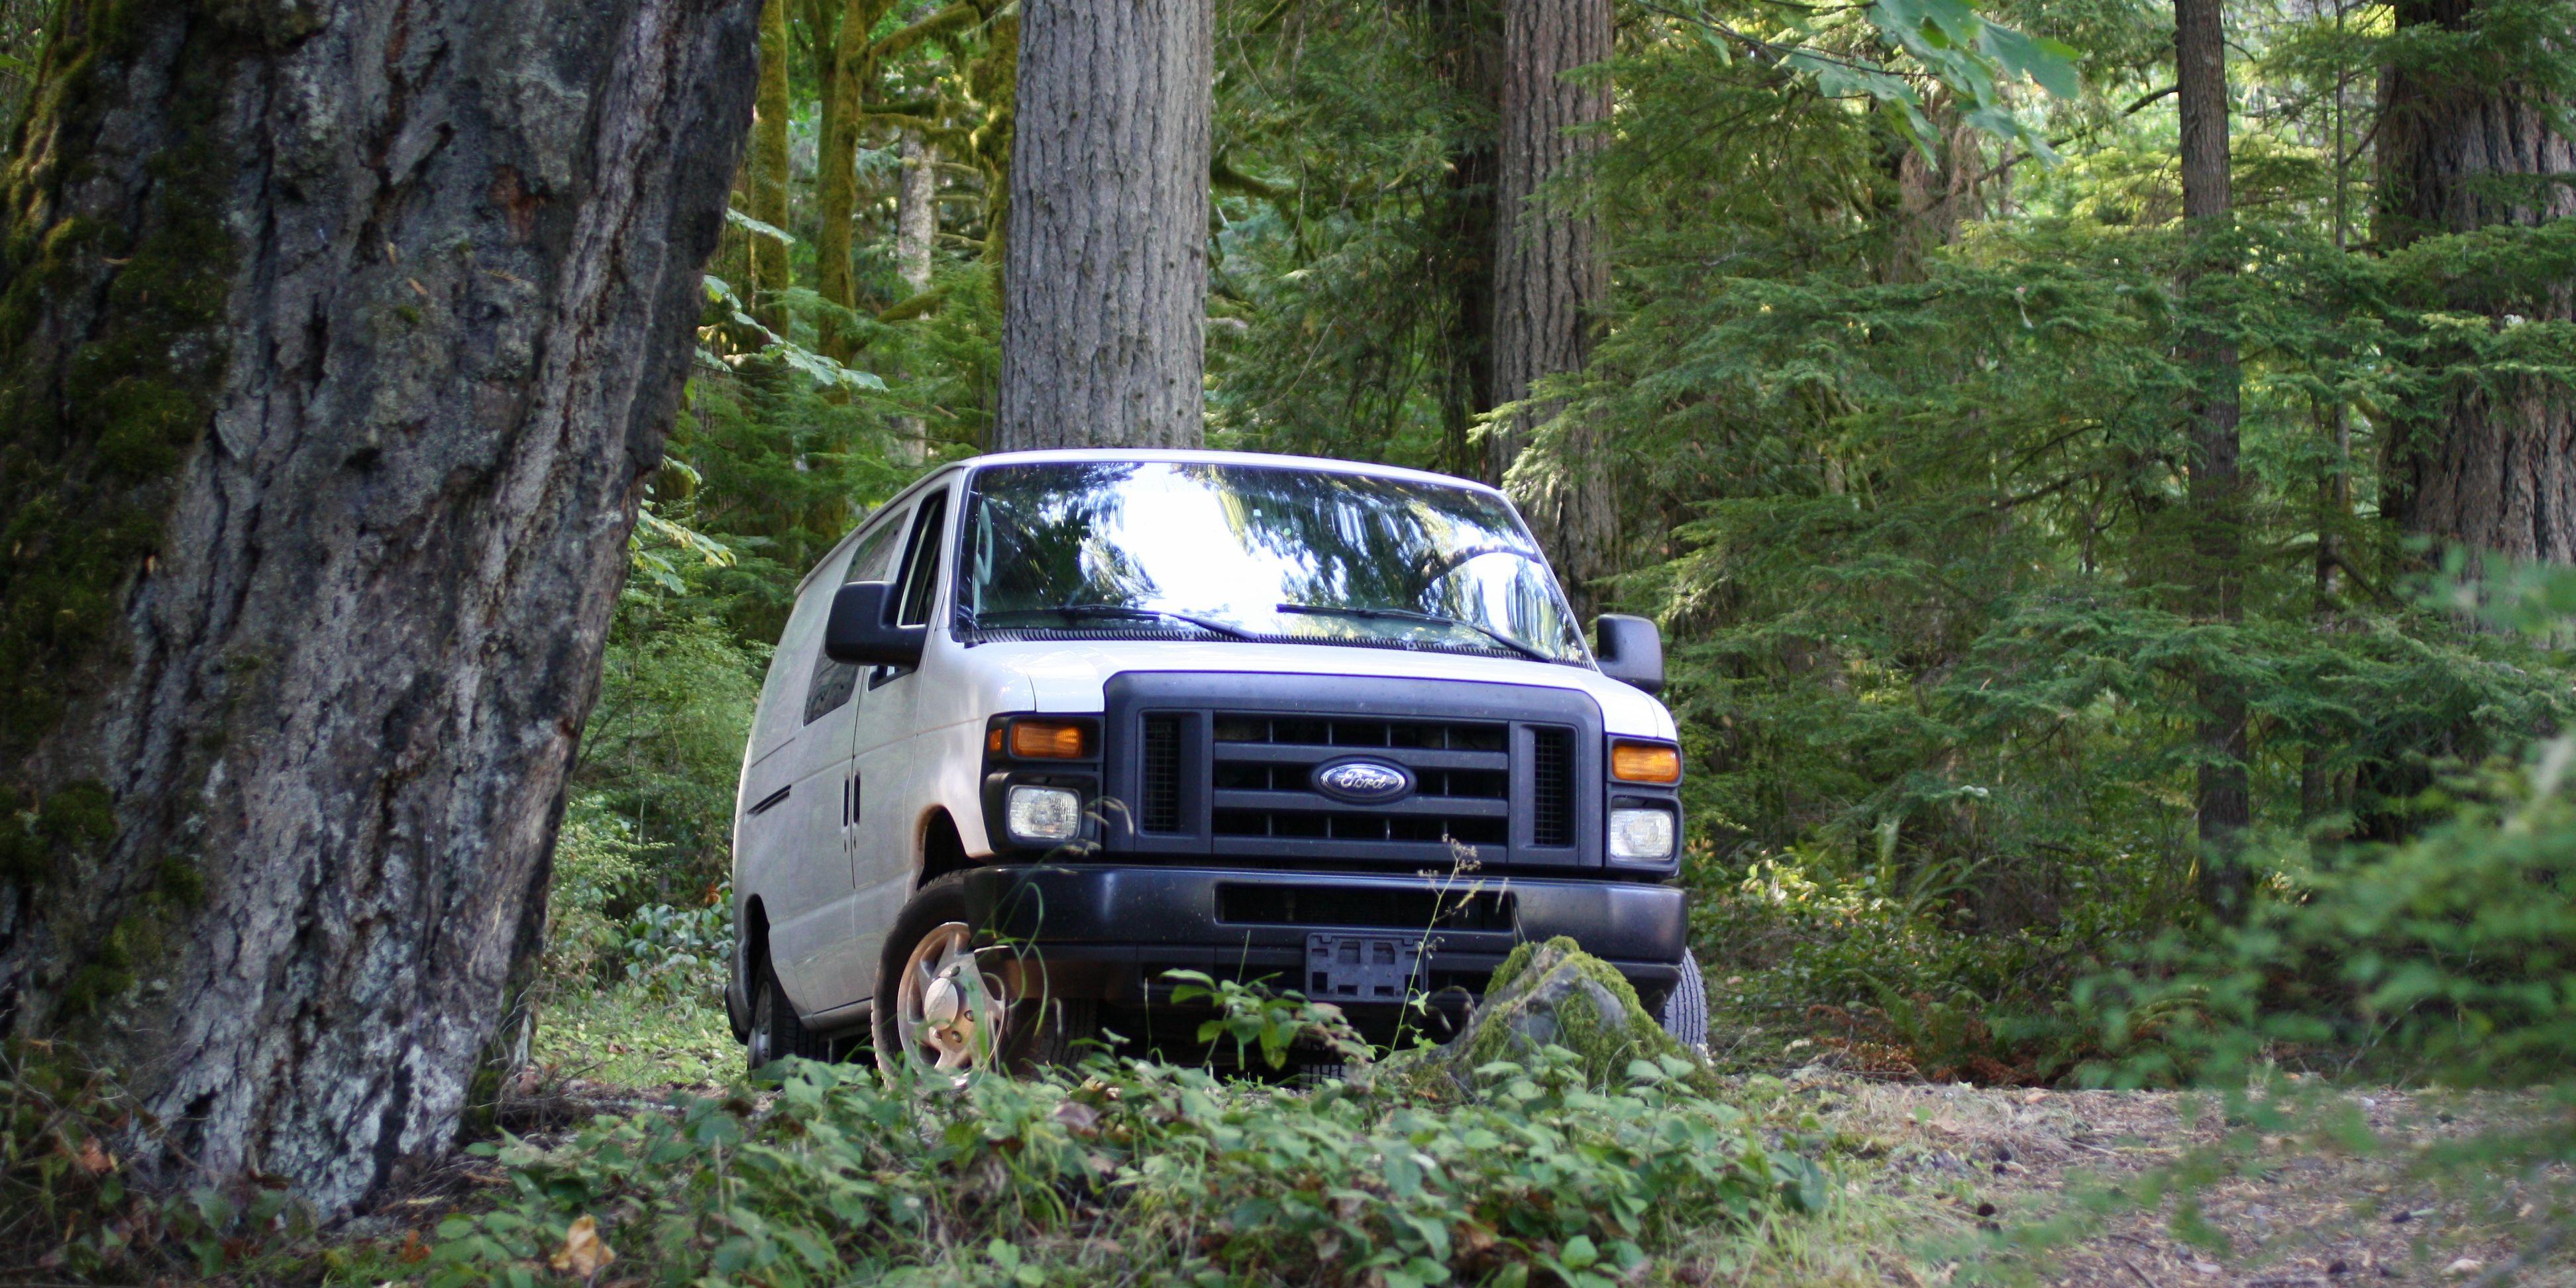 Ode To The Econoline 1980 Ford Cargo Van